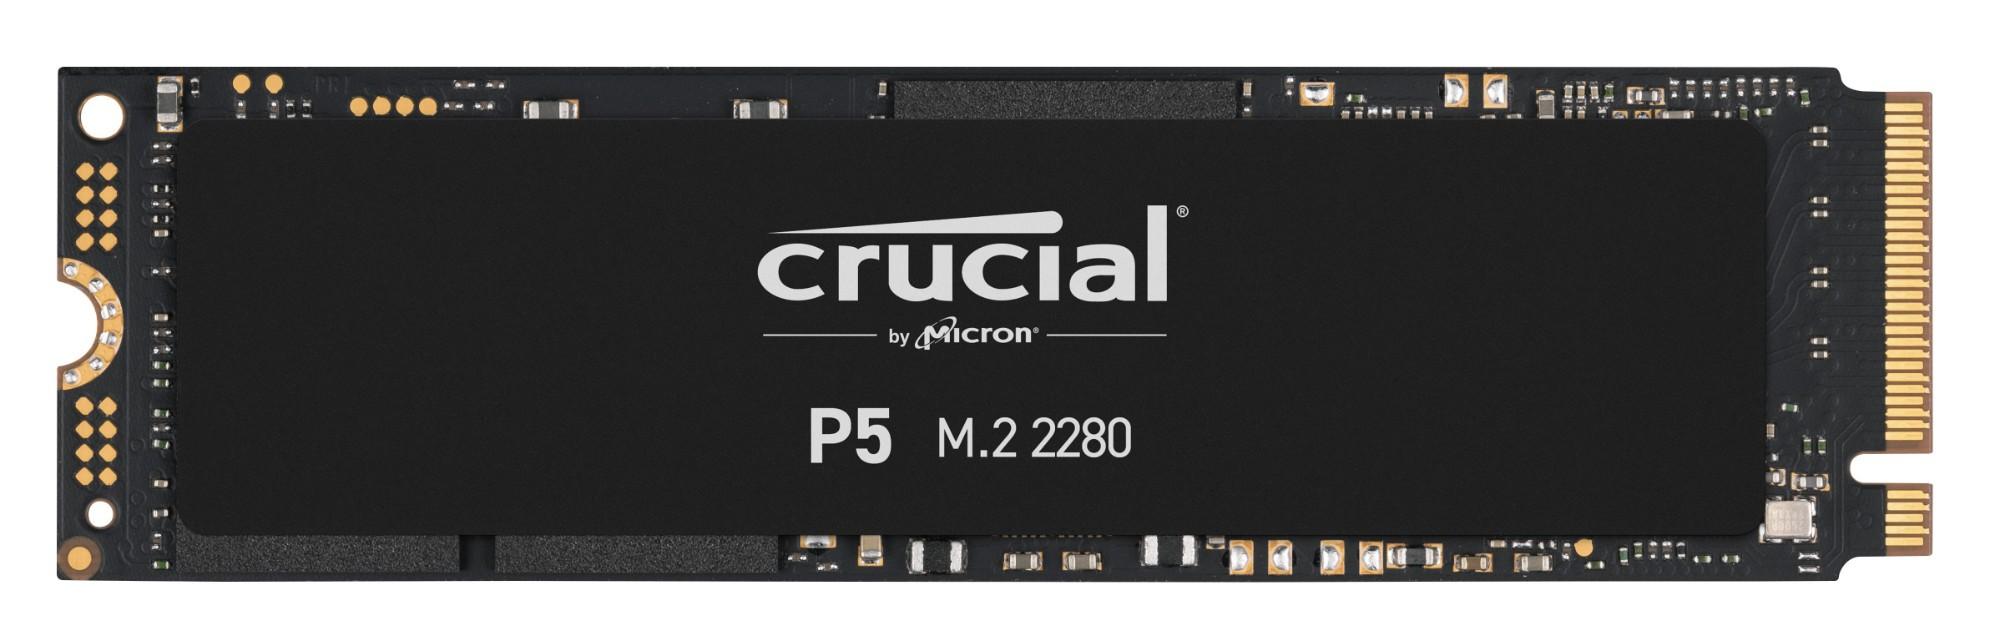 Crucial P5 M.2 250 GB PCI Express 3.0 3D NAND NVMe